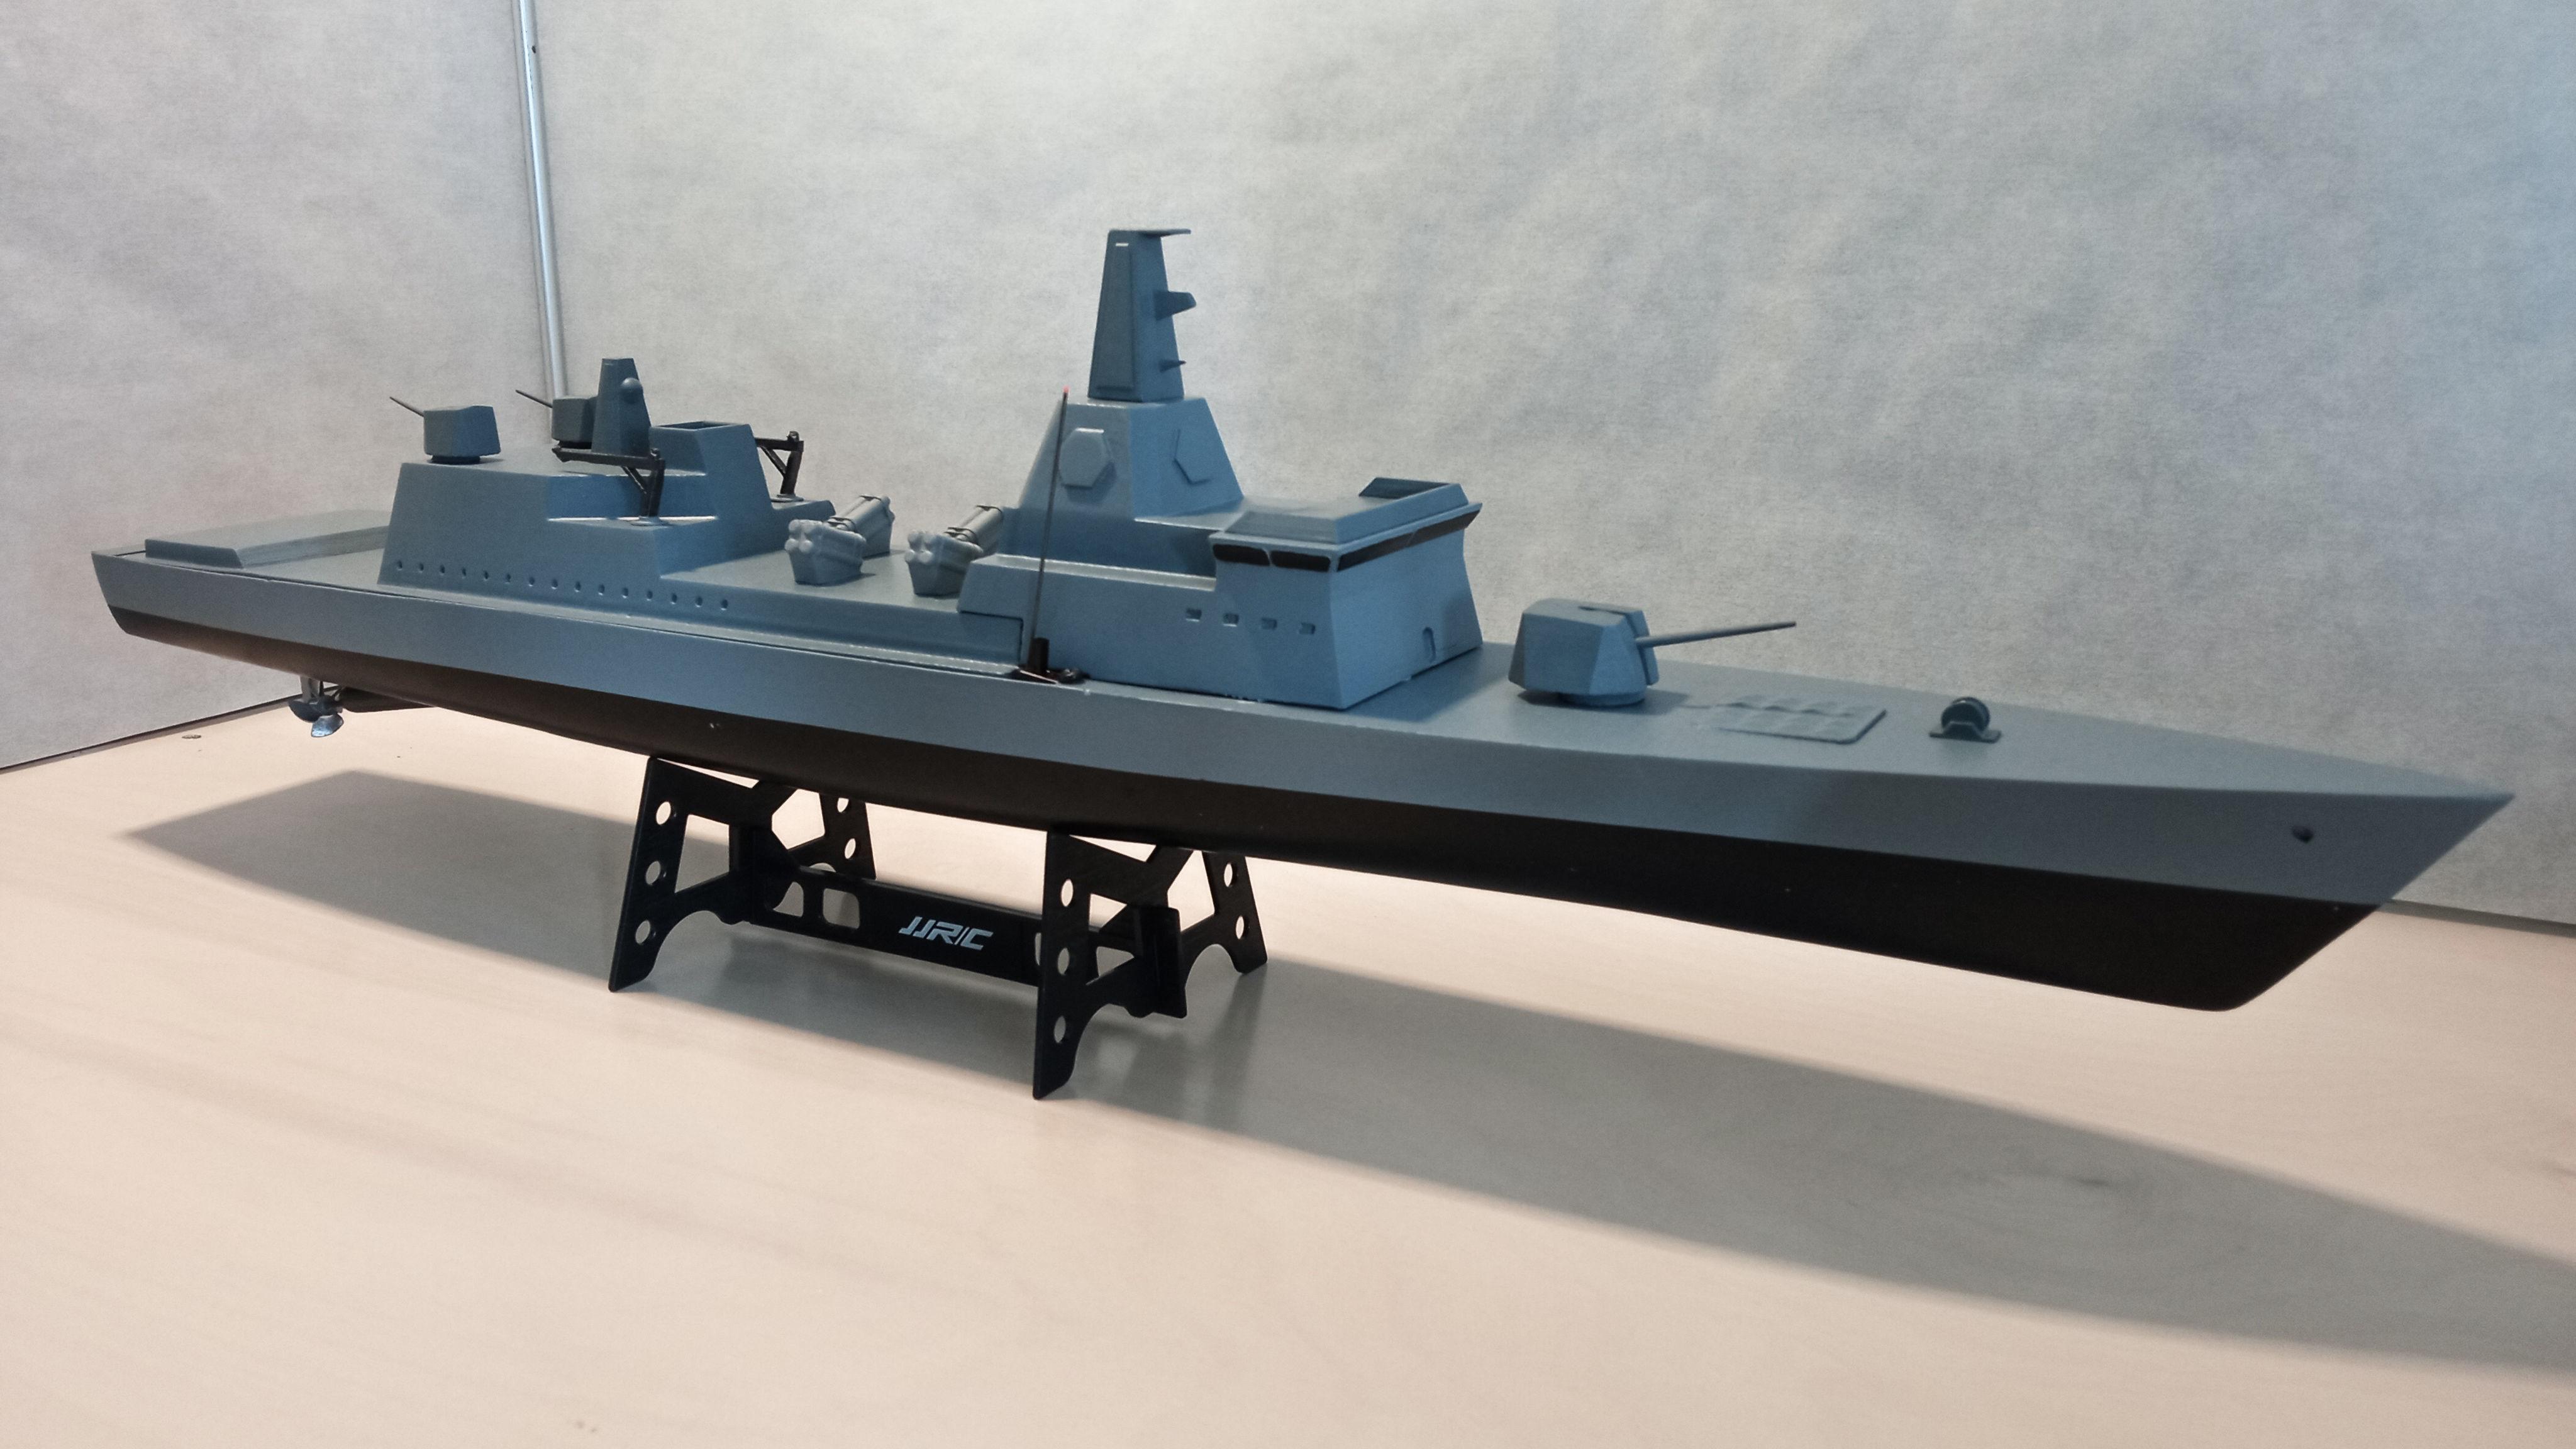 Cruiser - 3D print warship